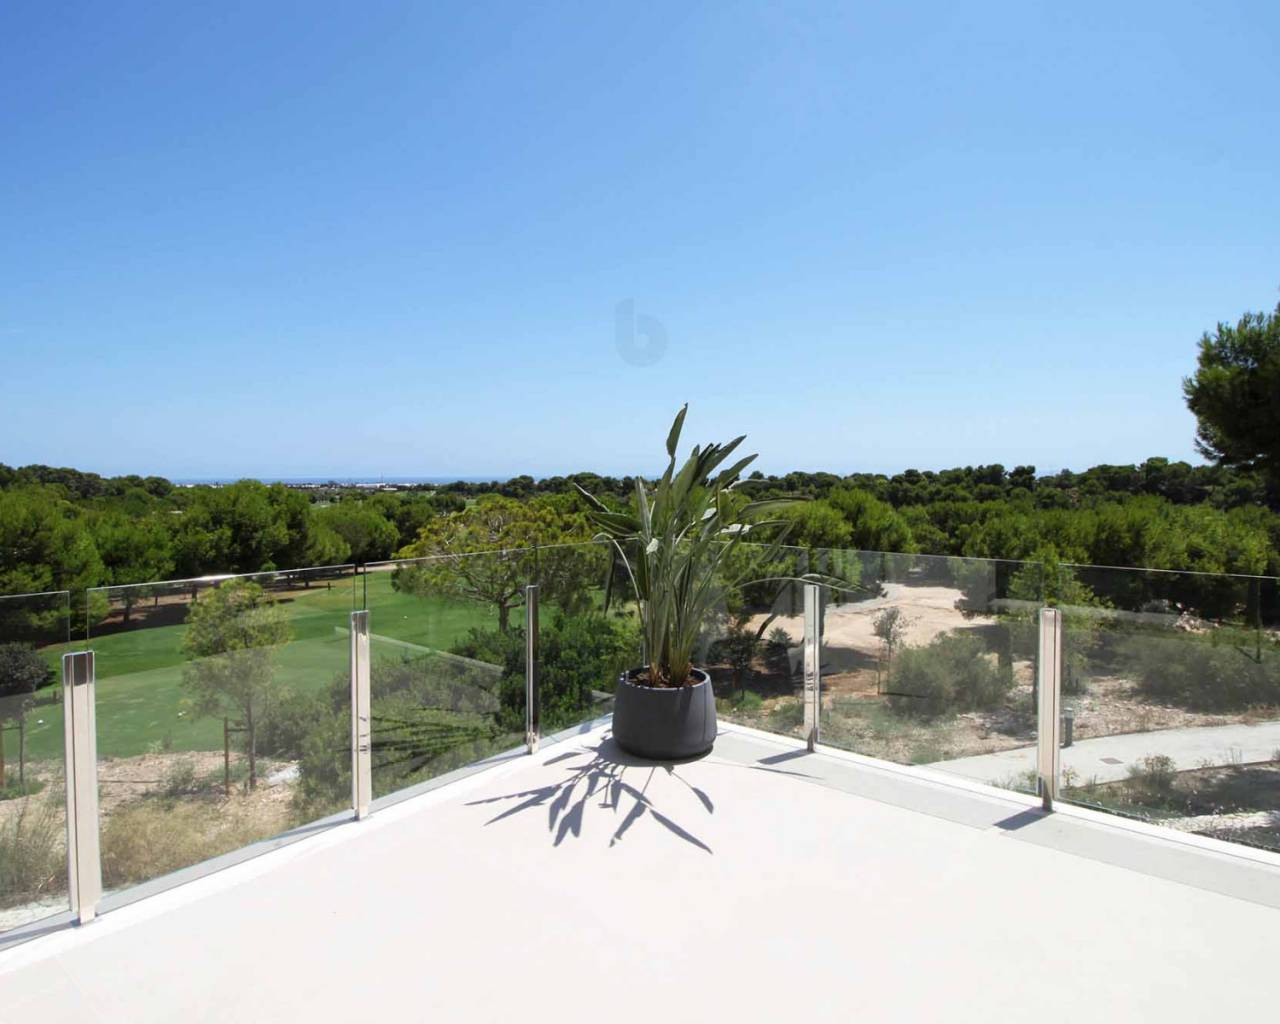 nieuwbouw-appartement-pilar-de-la-horadada_4543_xl